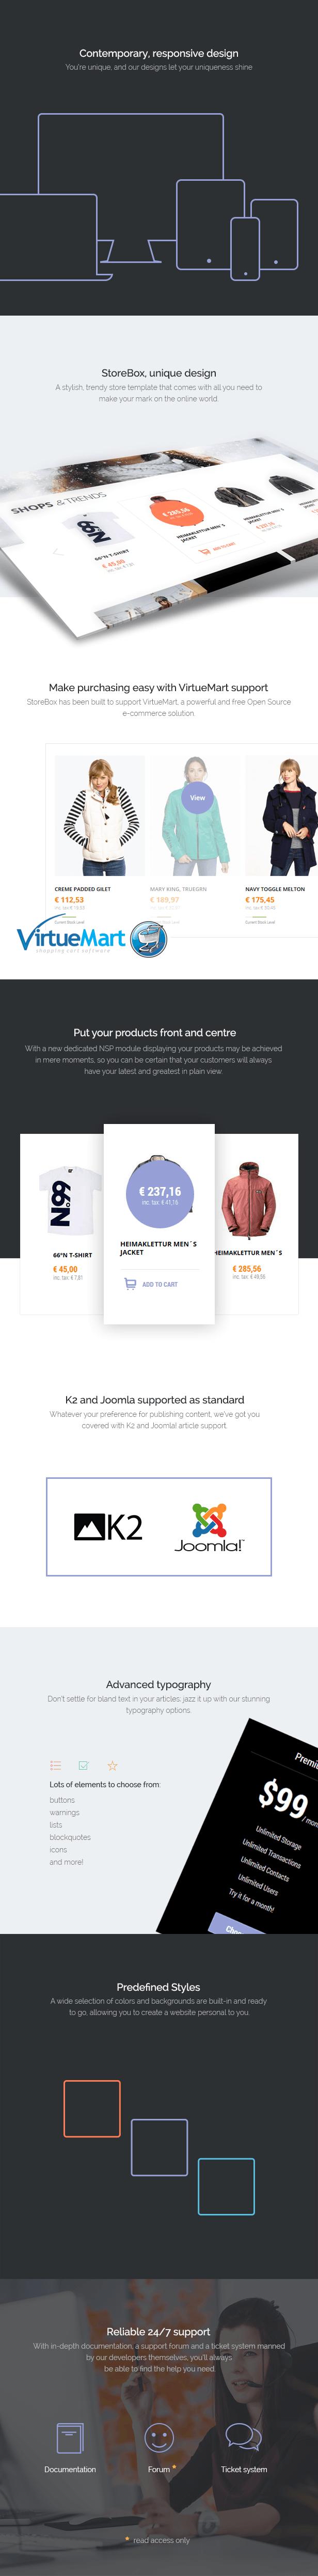 StroreBox - Best e-Commerce Joomla Theme for VirtueMart from GavickPro